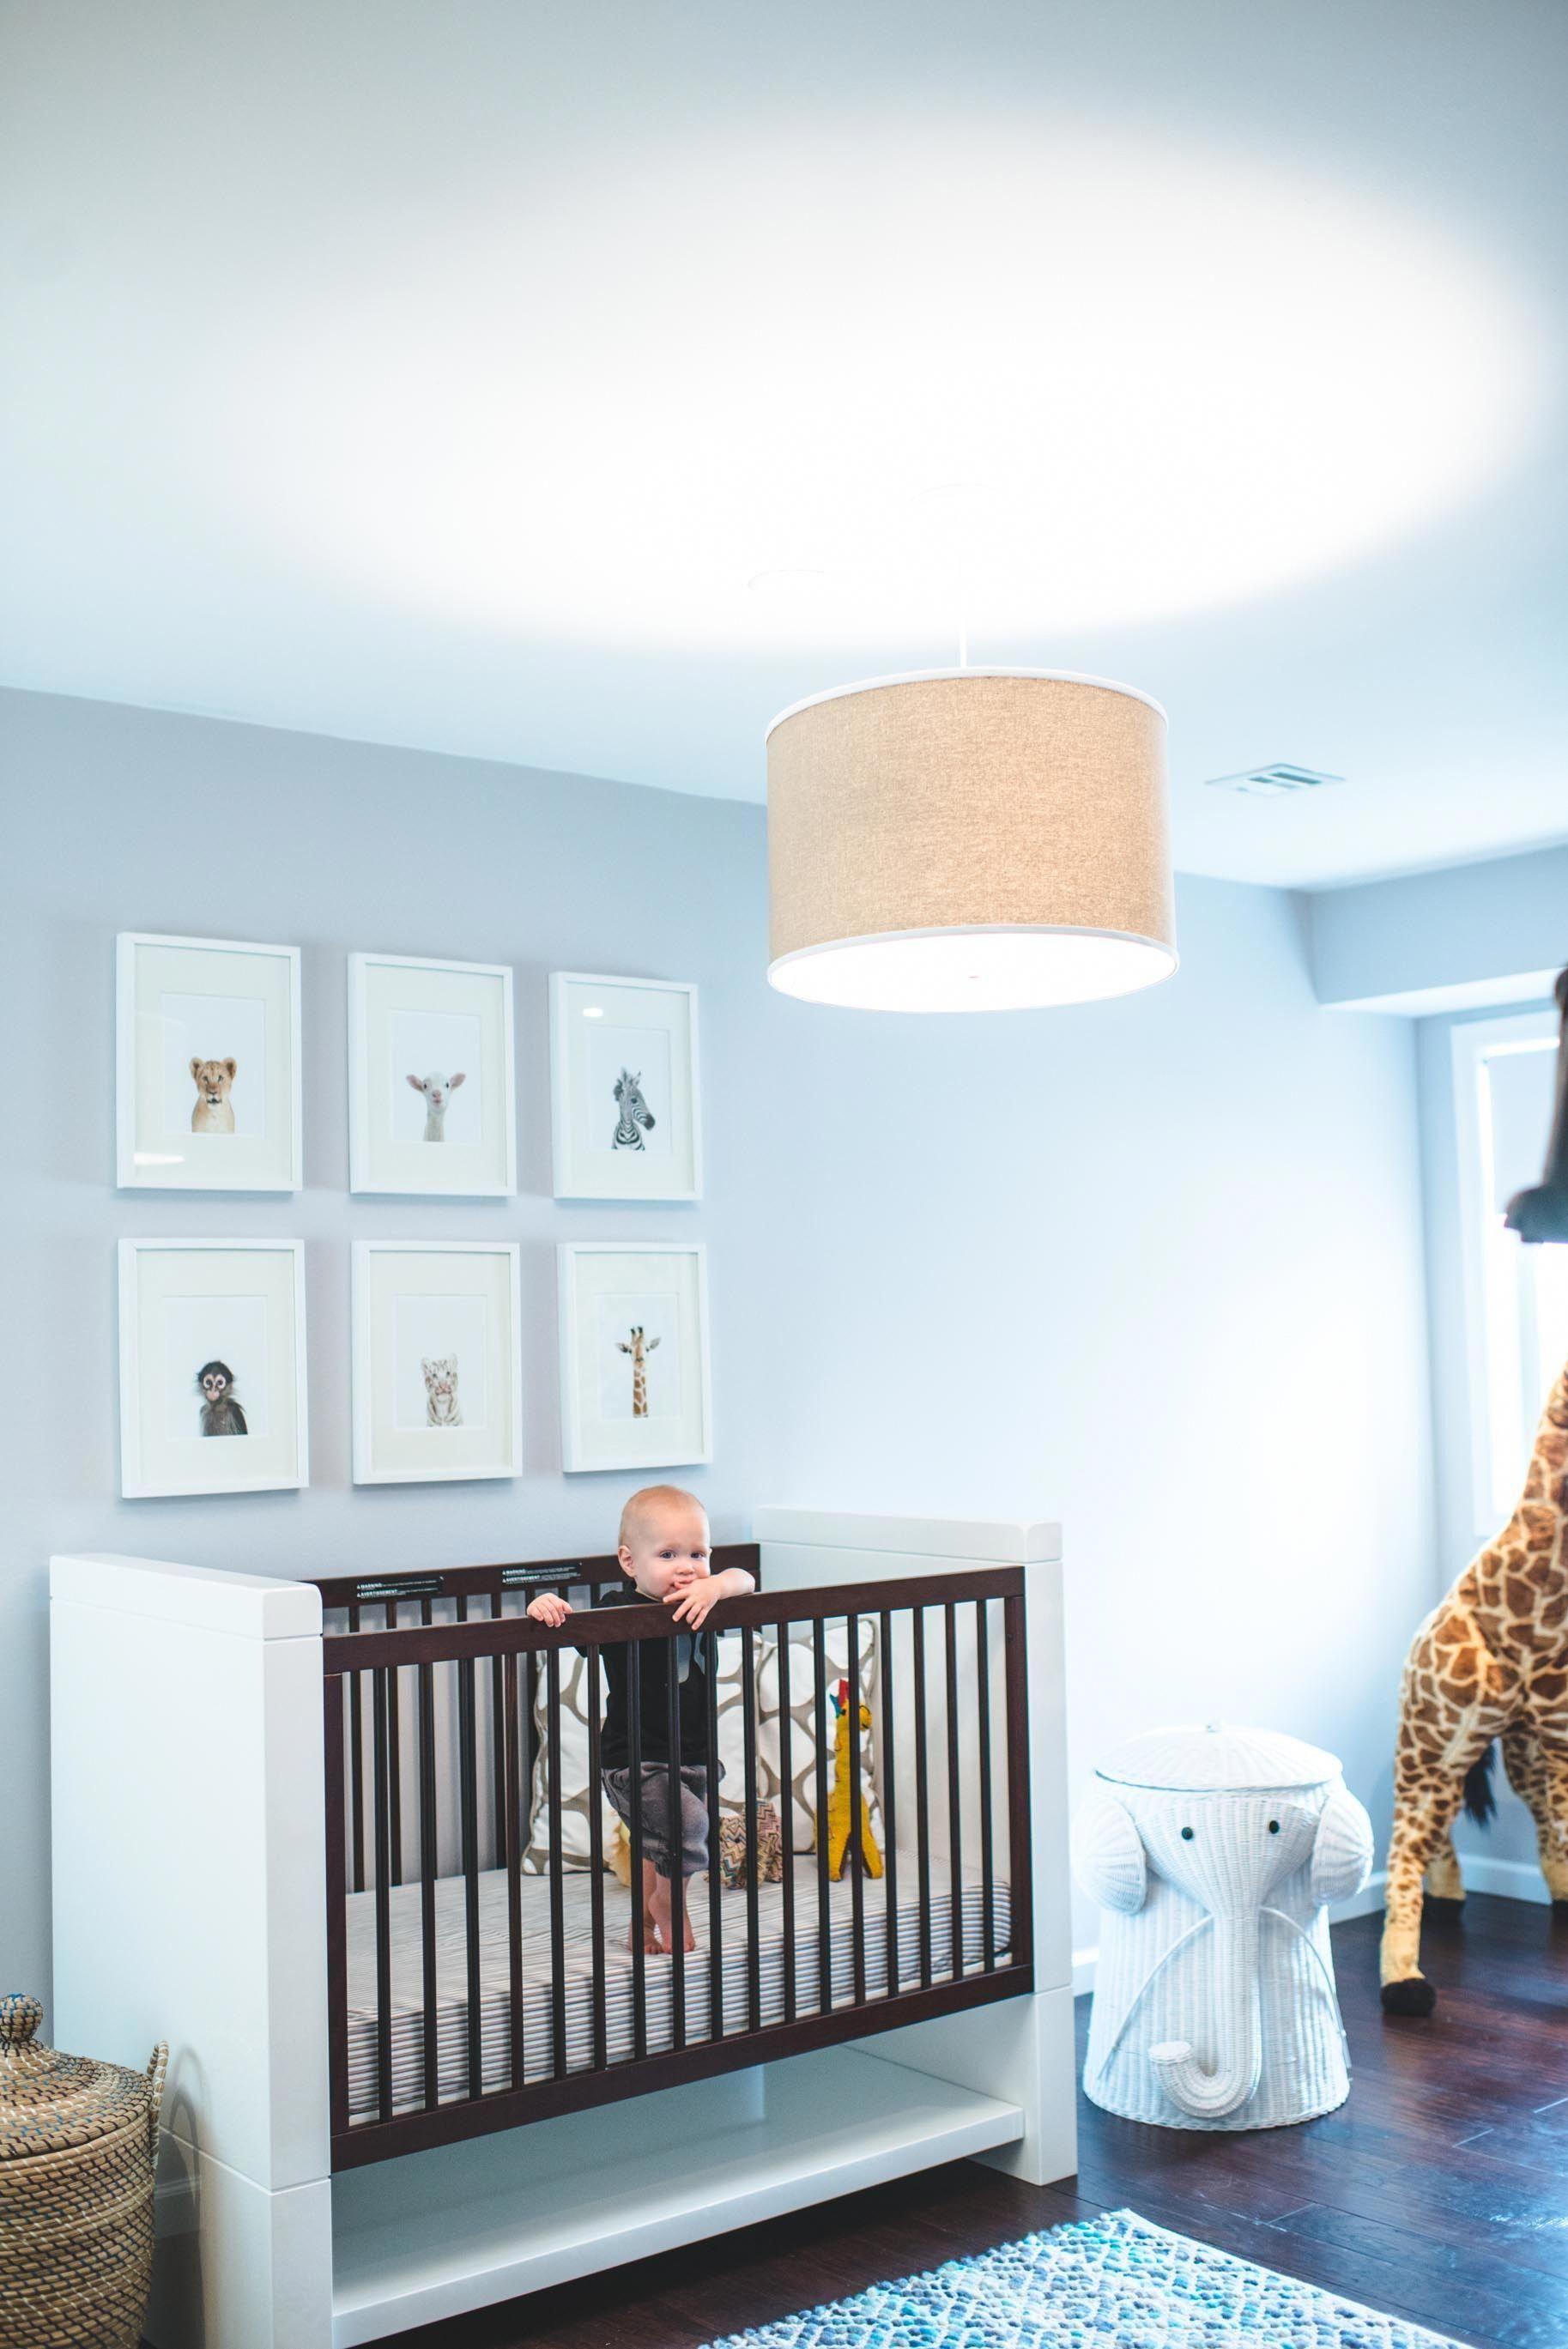 Amazing Boy Nursery: Check Out This Amazing Rustic Nursery